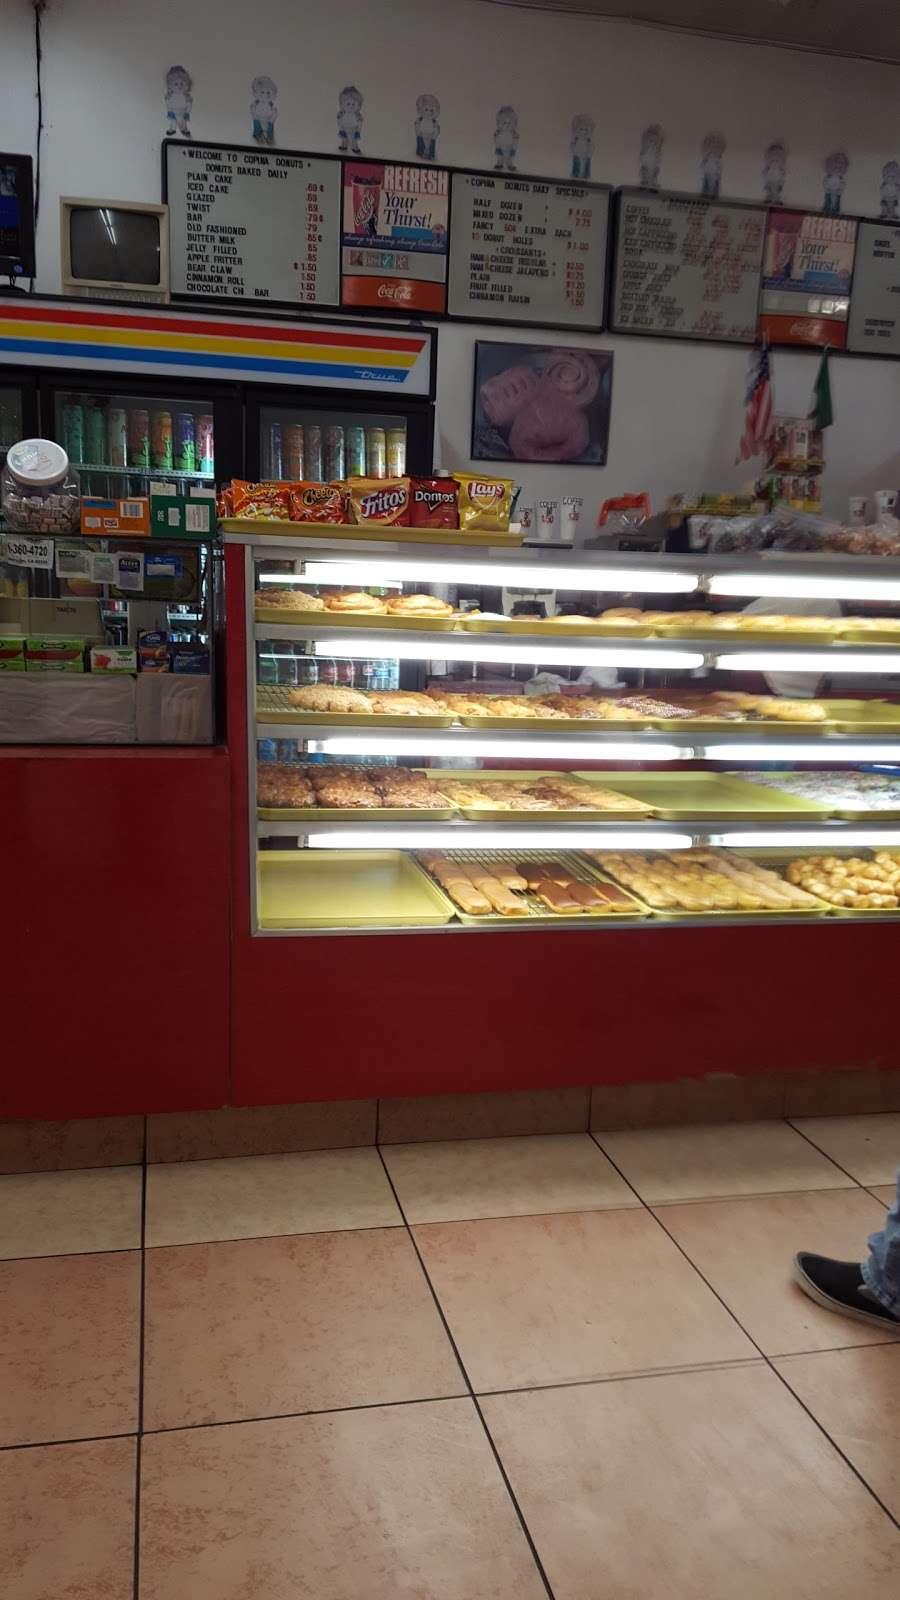 Copina Donuts - bakery  | Photo 2 of 3 | Address: 9007 Mission Boulevard, Riverside, CA 92509, USA | Phone: (951) 685-1332